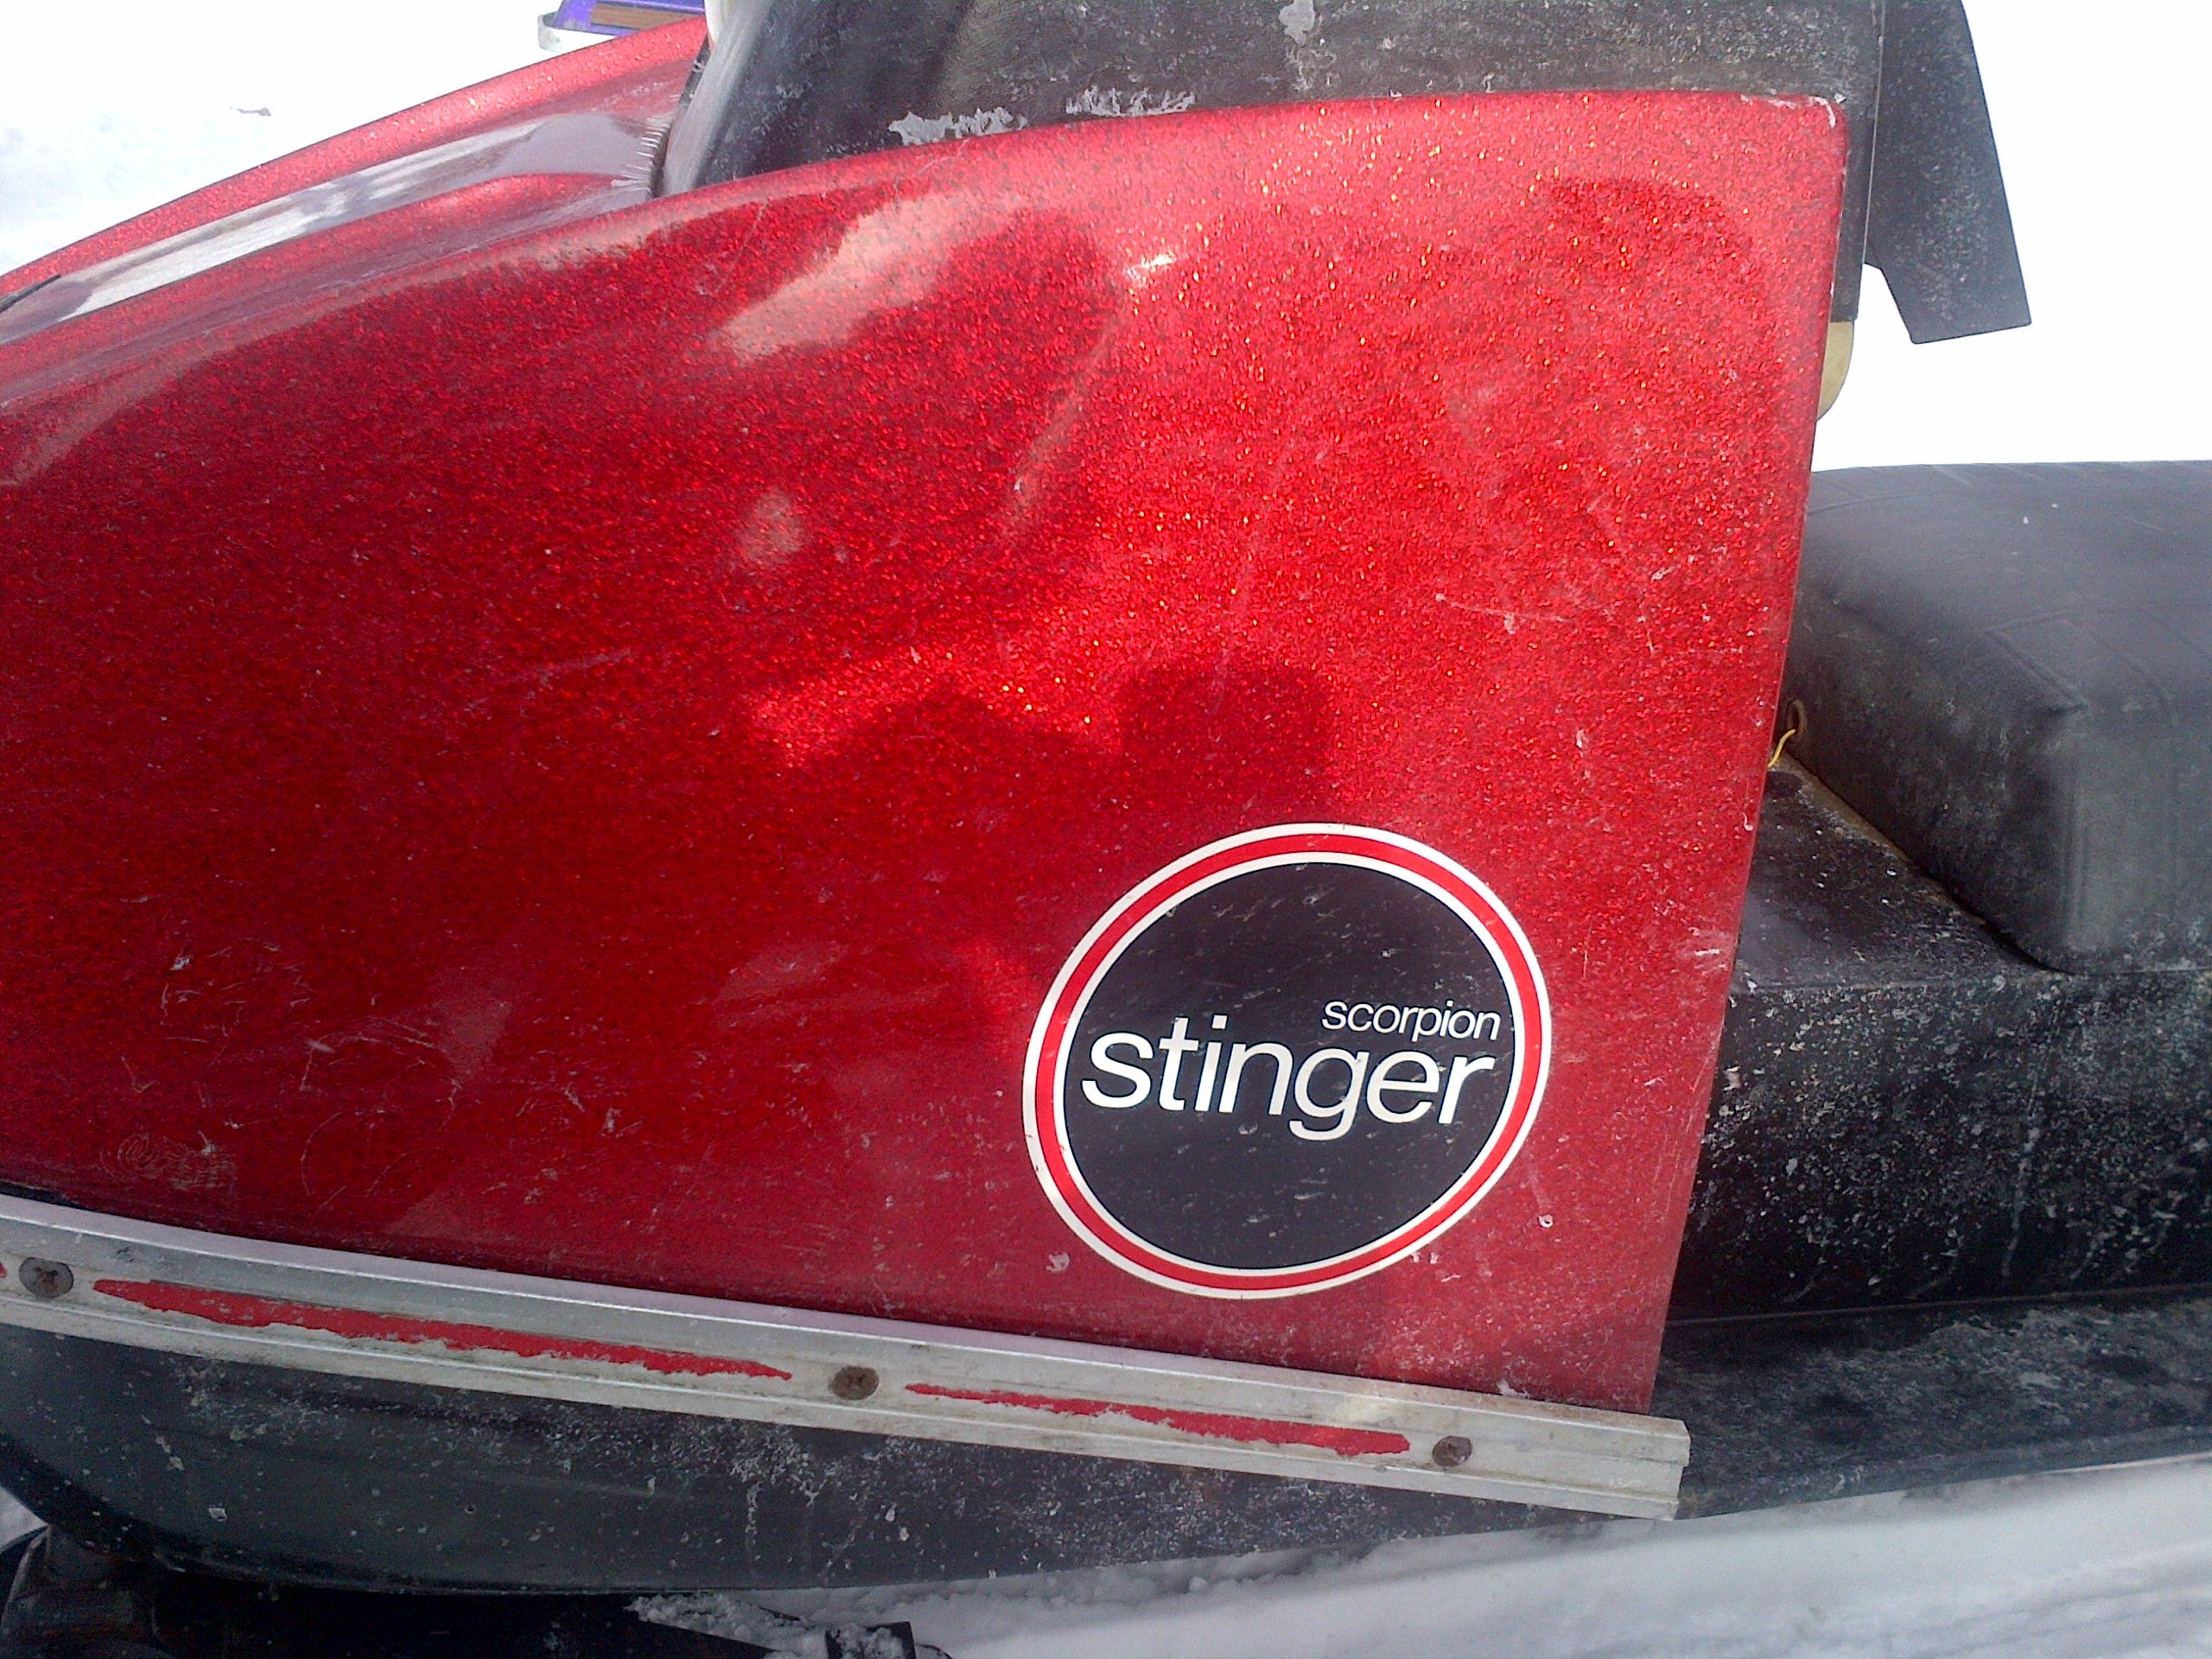 1971 Scorpion Stinger Scorpion Snowmobiles Scorpion Sled